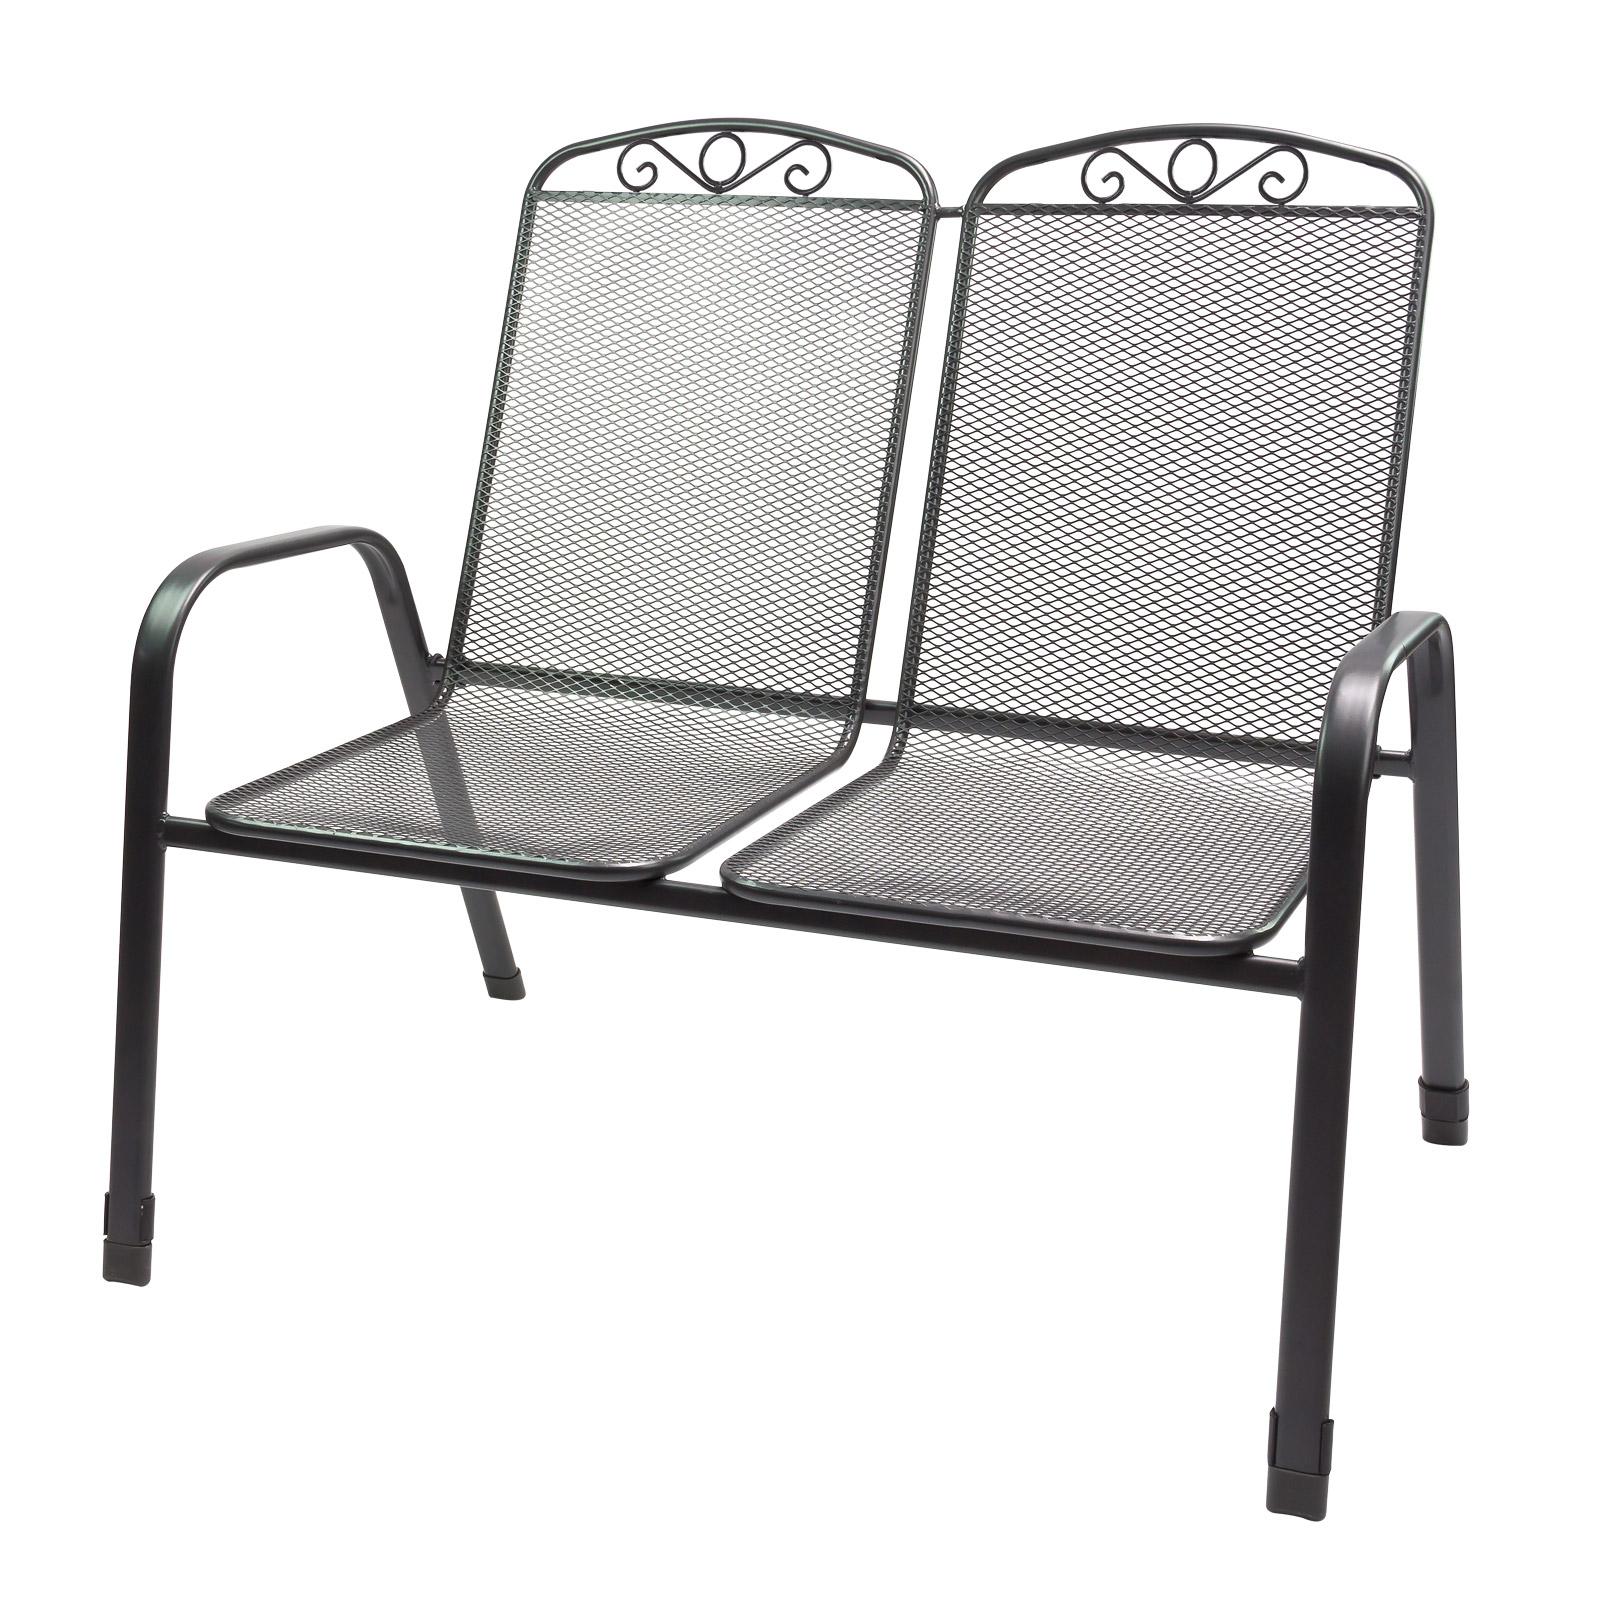 Dema Gartenstuhl Doppelsitzer Zweisitzer Virginia Streckmetall Stapelbar bis 180kg 94048